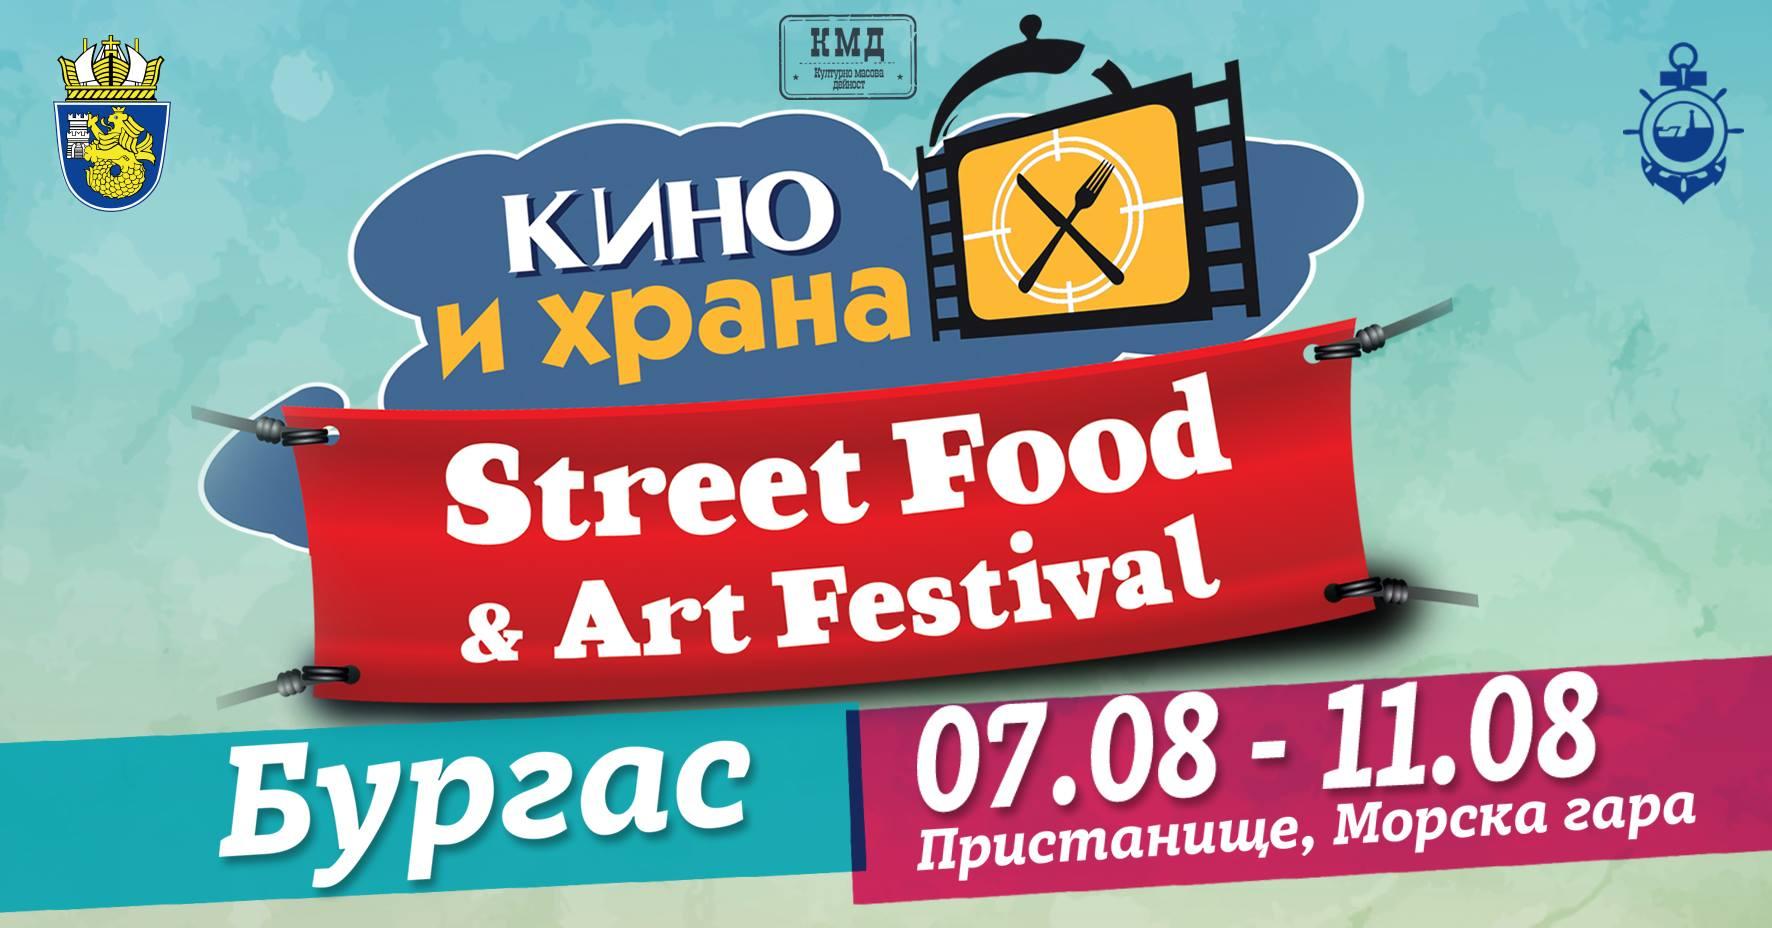 "Street Food & Art Festival ""Кино и Храна"" - Бургас"